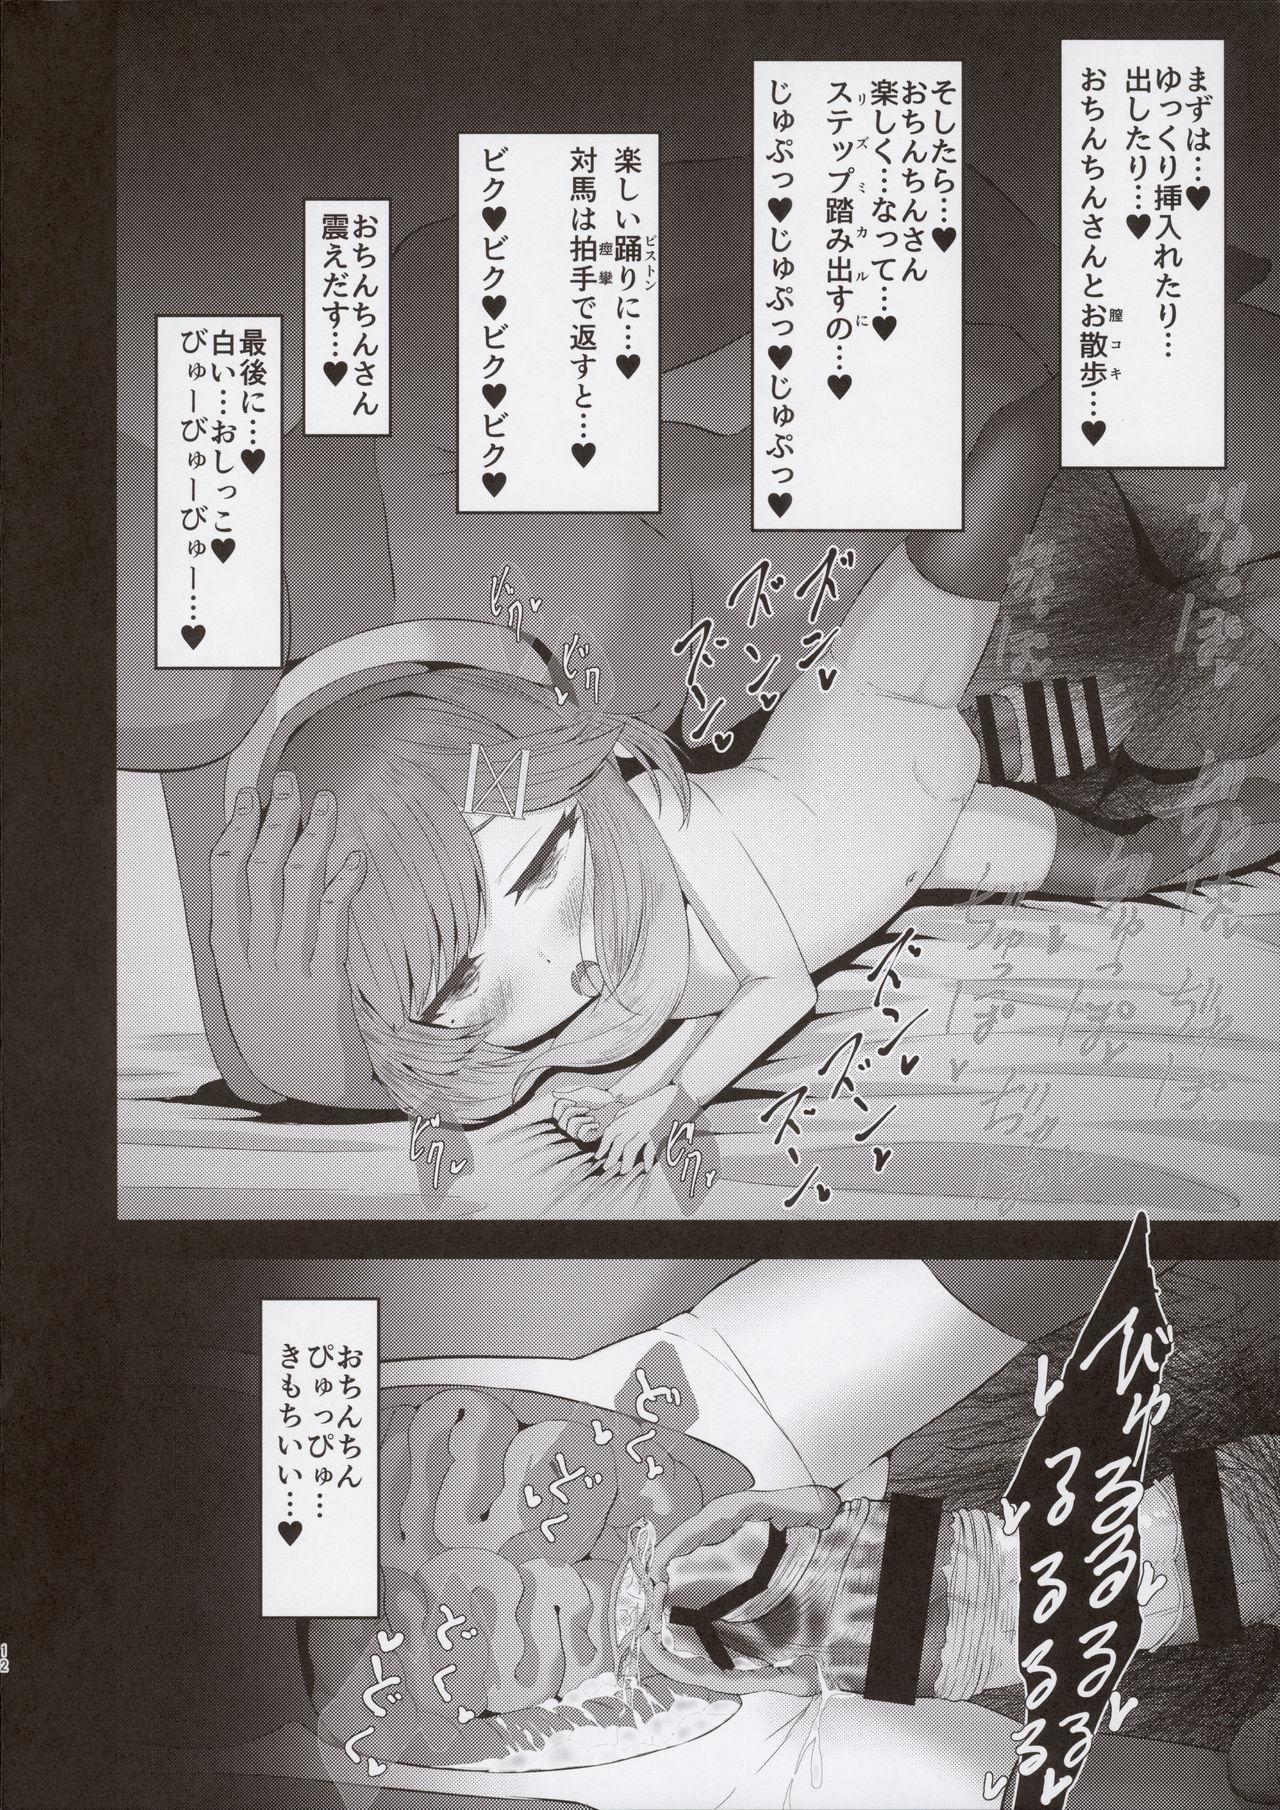 Tsushima to Himegoto 11